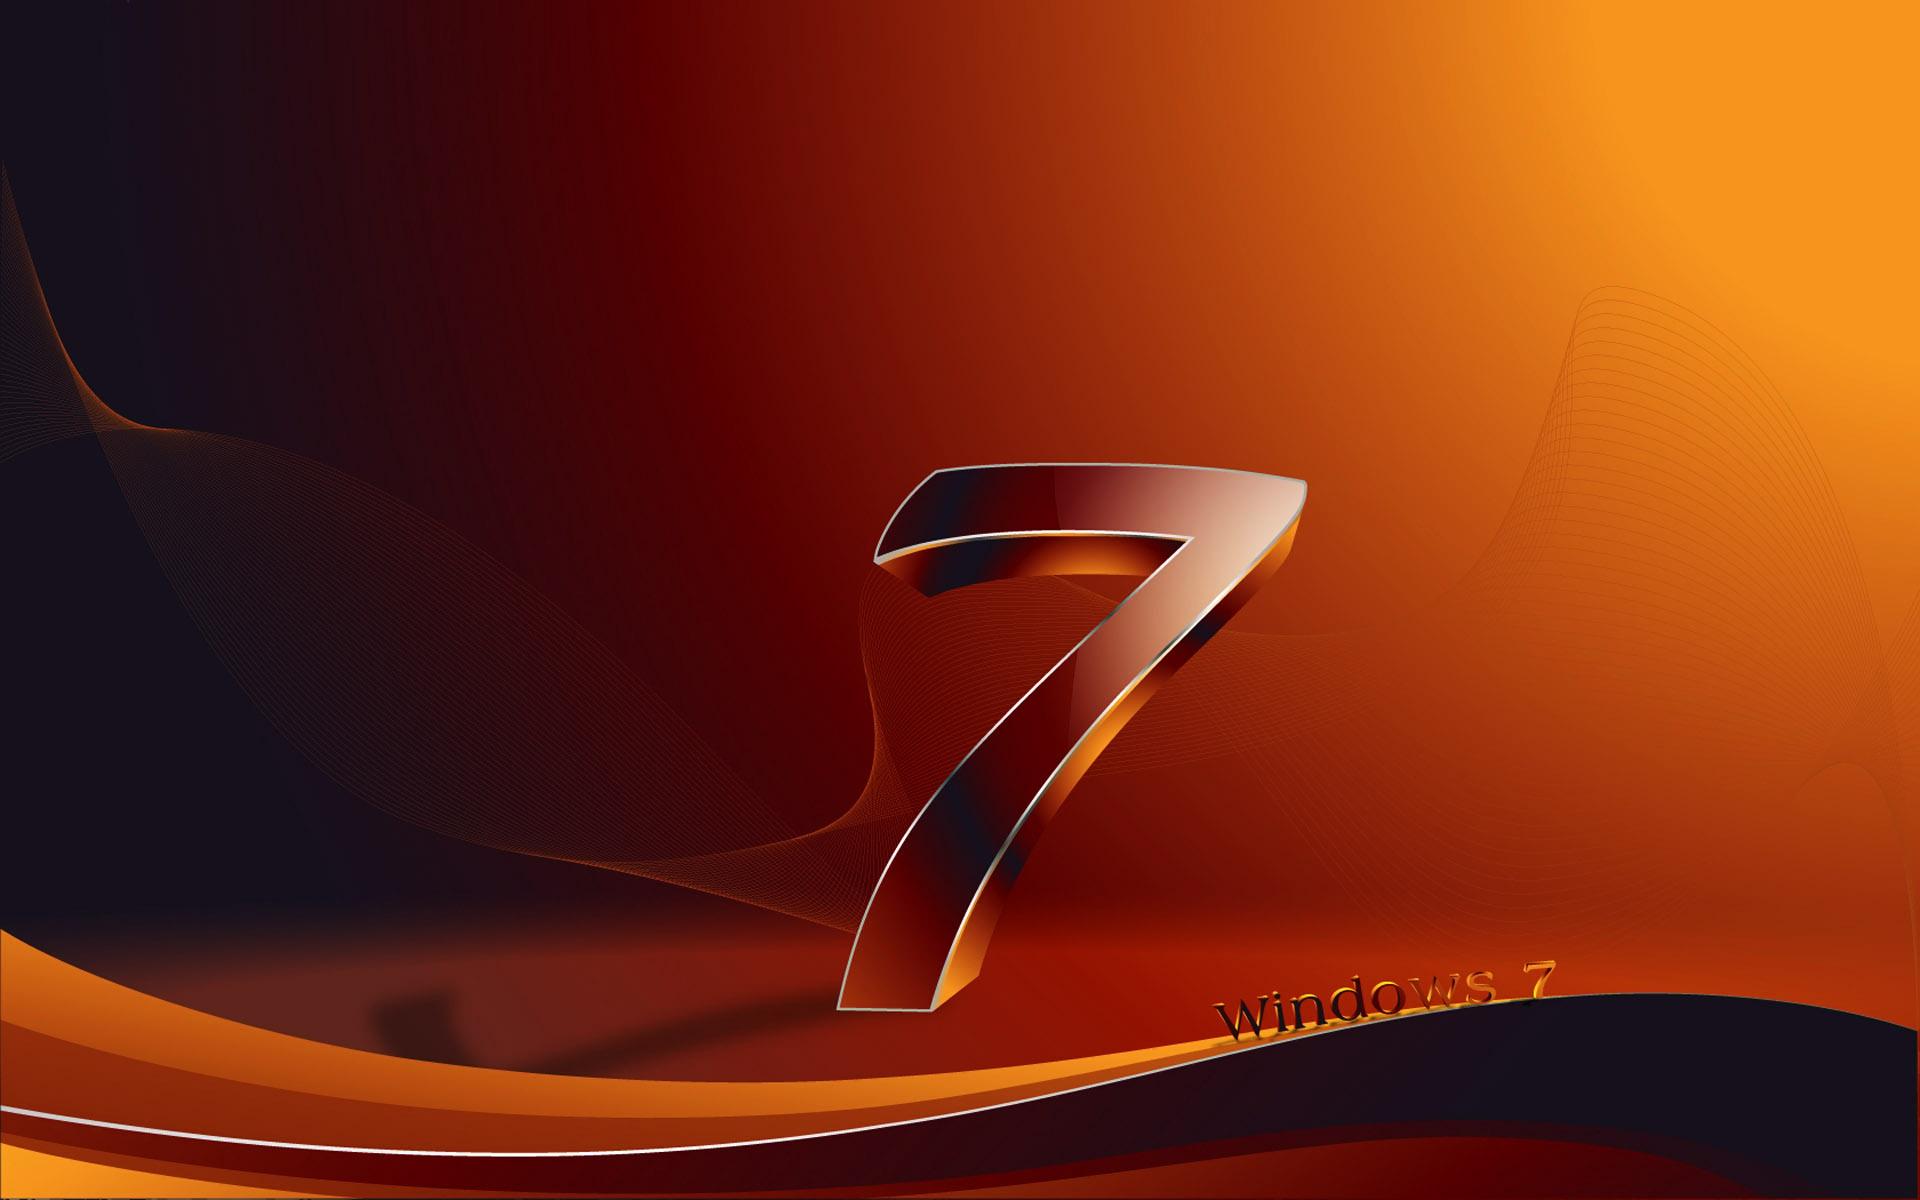 Windows 7 Wallpaper _8_